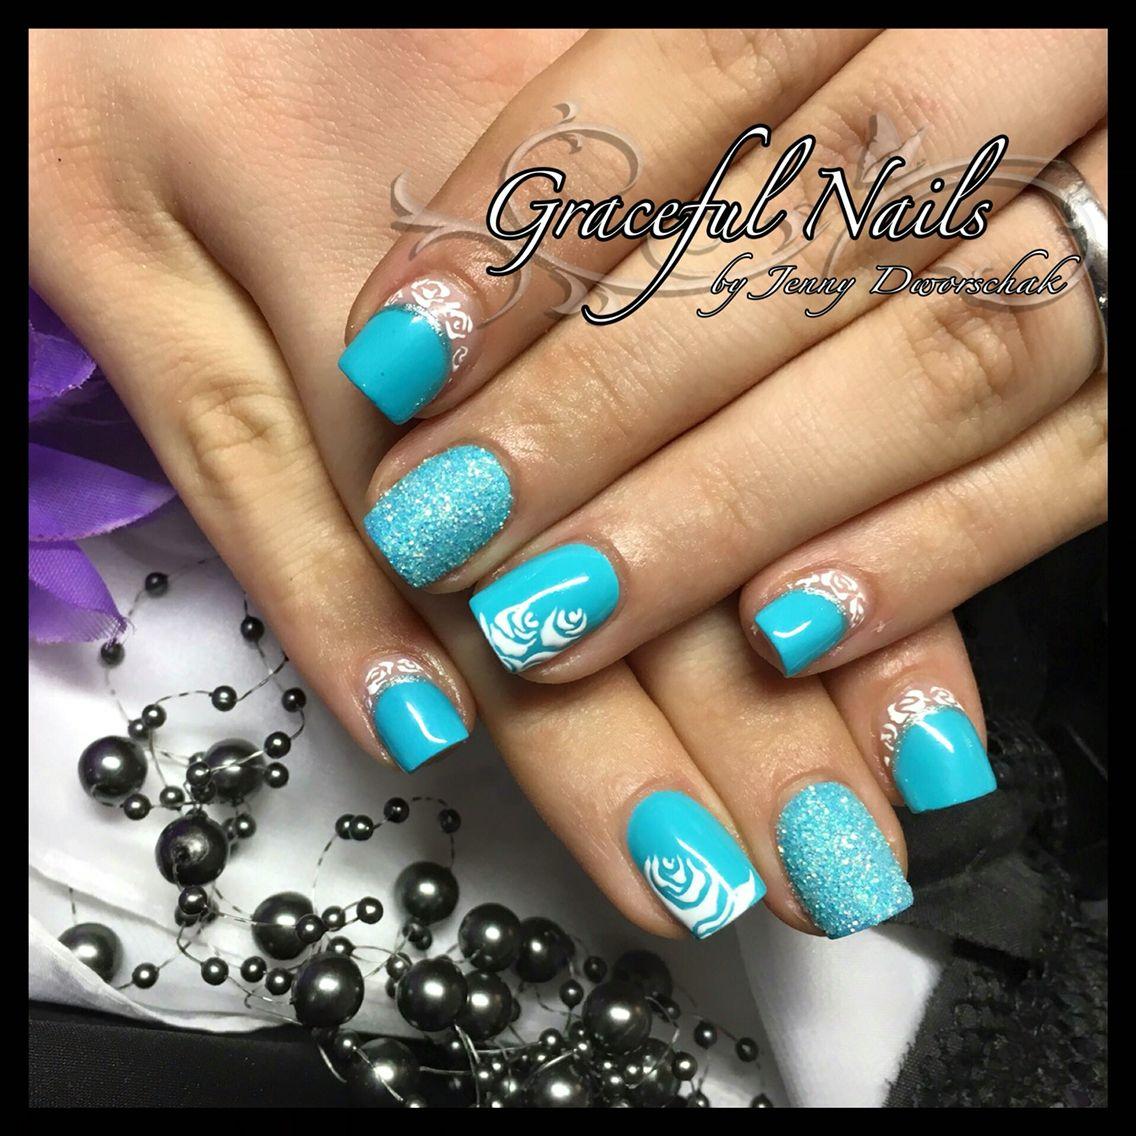 Fullcover Design Nails Gelmalerei Türkis weiß Nägel Nailart | Nails ...